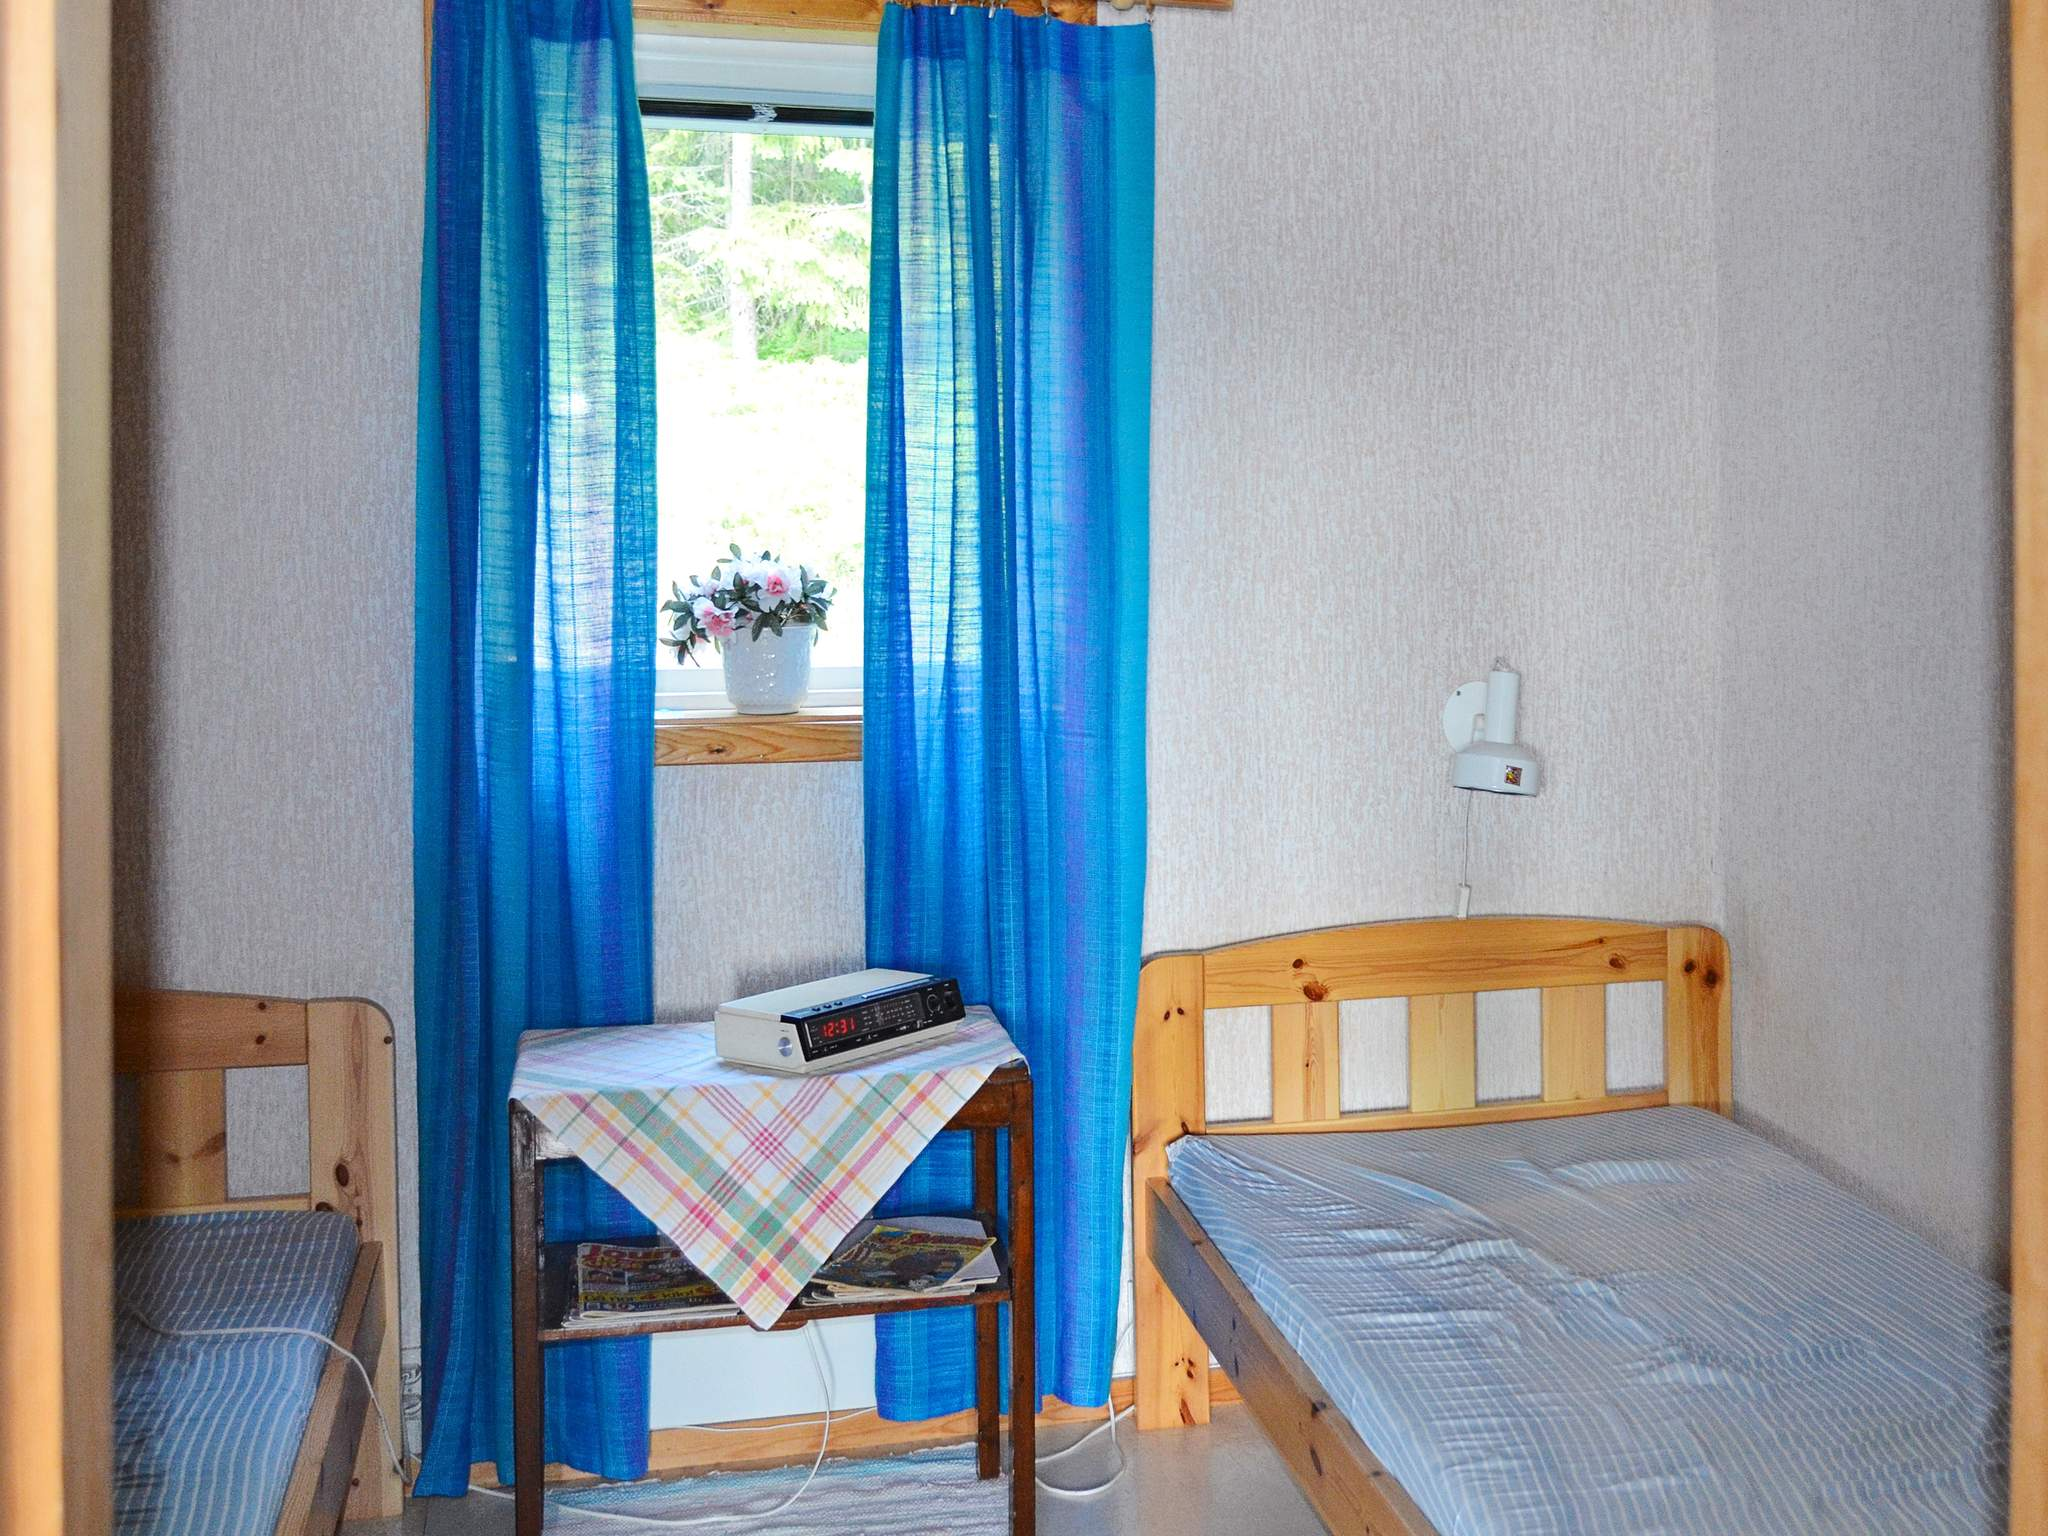 Ferienhaus Nordmaling (1026050), Lögdeå, Västerbottens län, Nordschweden, Schweden, Bild 7